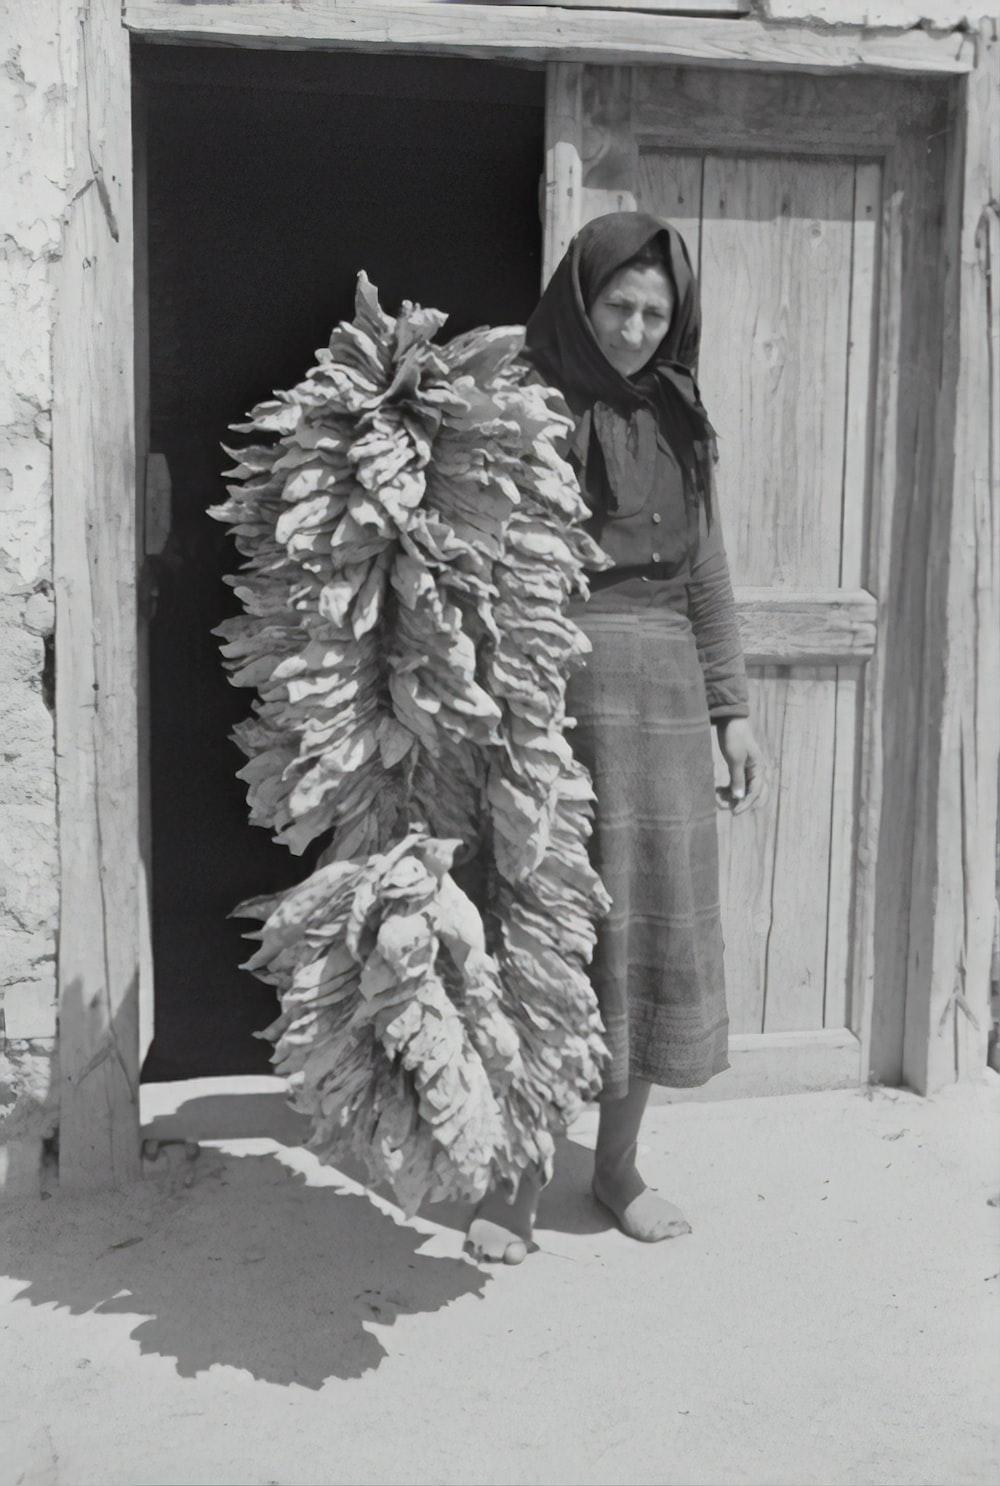 woman in black jacket and white skirt standing beside wooden door